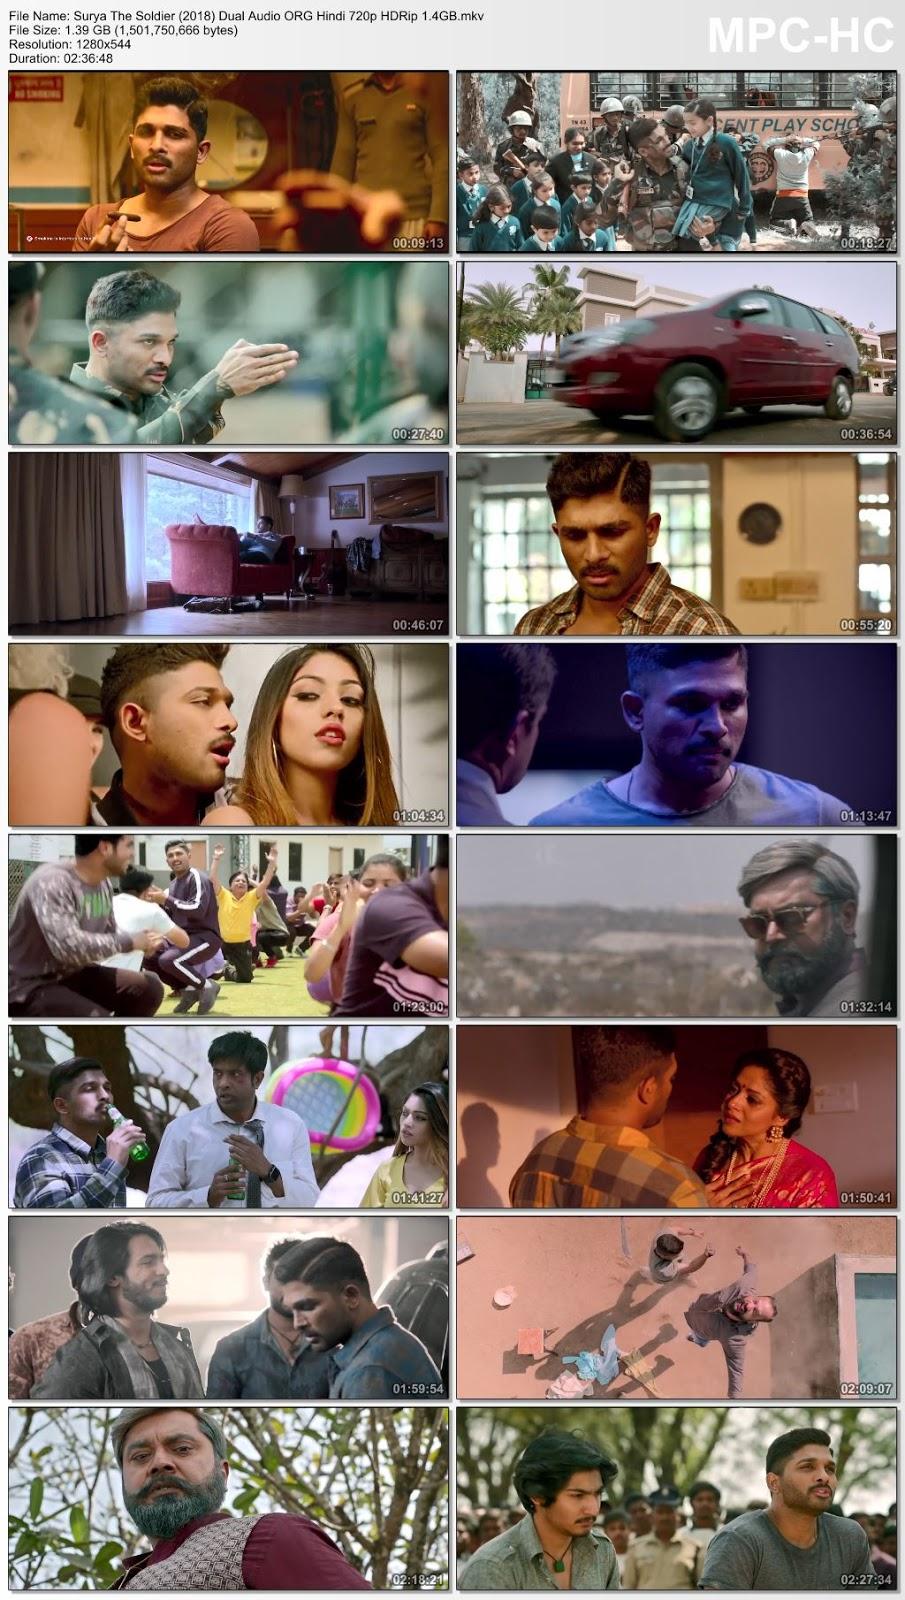 Surya The Soldier (2018) Dual Audio ORG Hindi 720p HDRip 1.4GB Desirehub